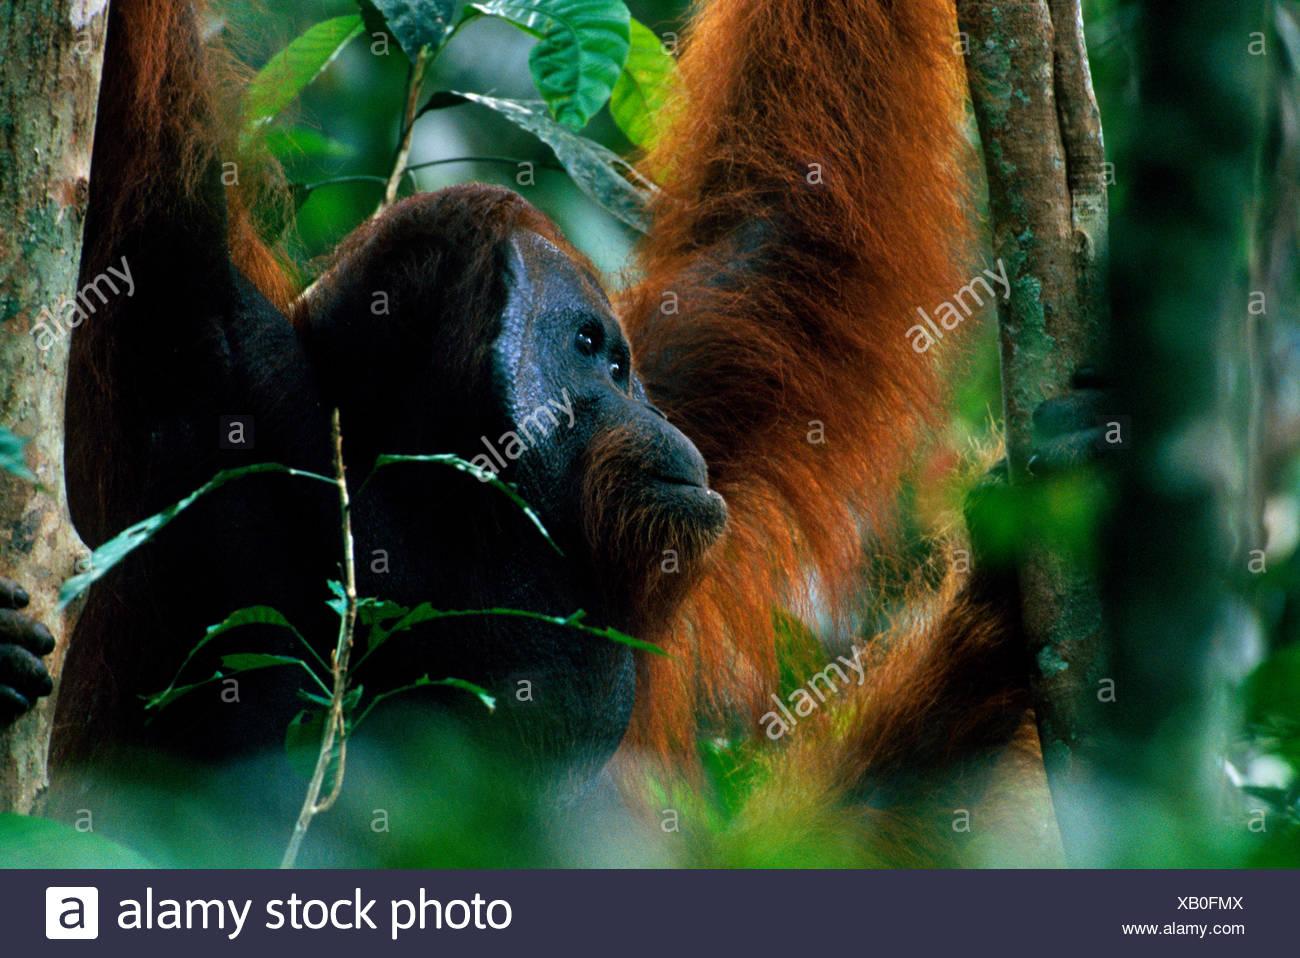 Adult male Bornean orangutan (Pongo pygmaeus) in rainforest canopy, Gunung Palung National Park, Borneo, West Kalimantan, Indonesia - Stock Image